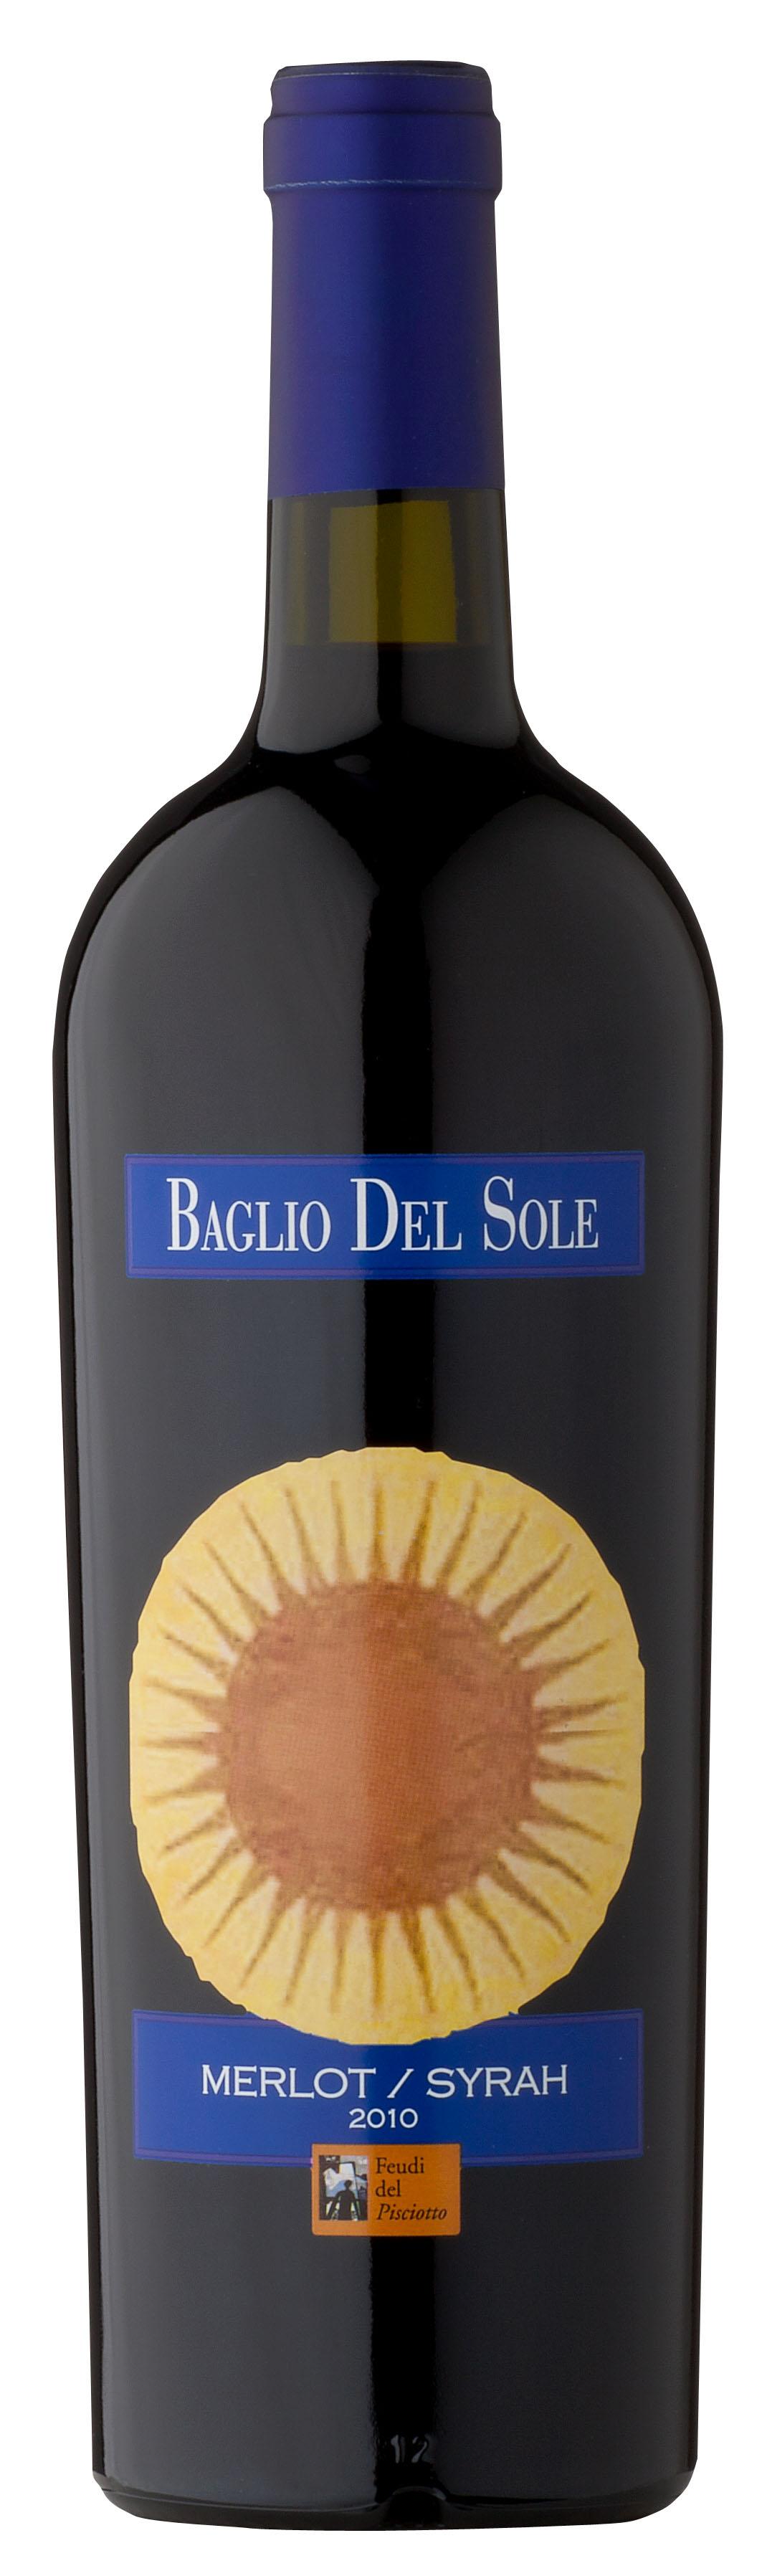 """Baglio del Sole"" Merlot & Syrah Terre Siciliane 2017 750 ML Feudi del Pisciotto"